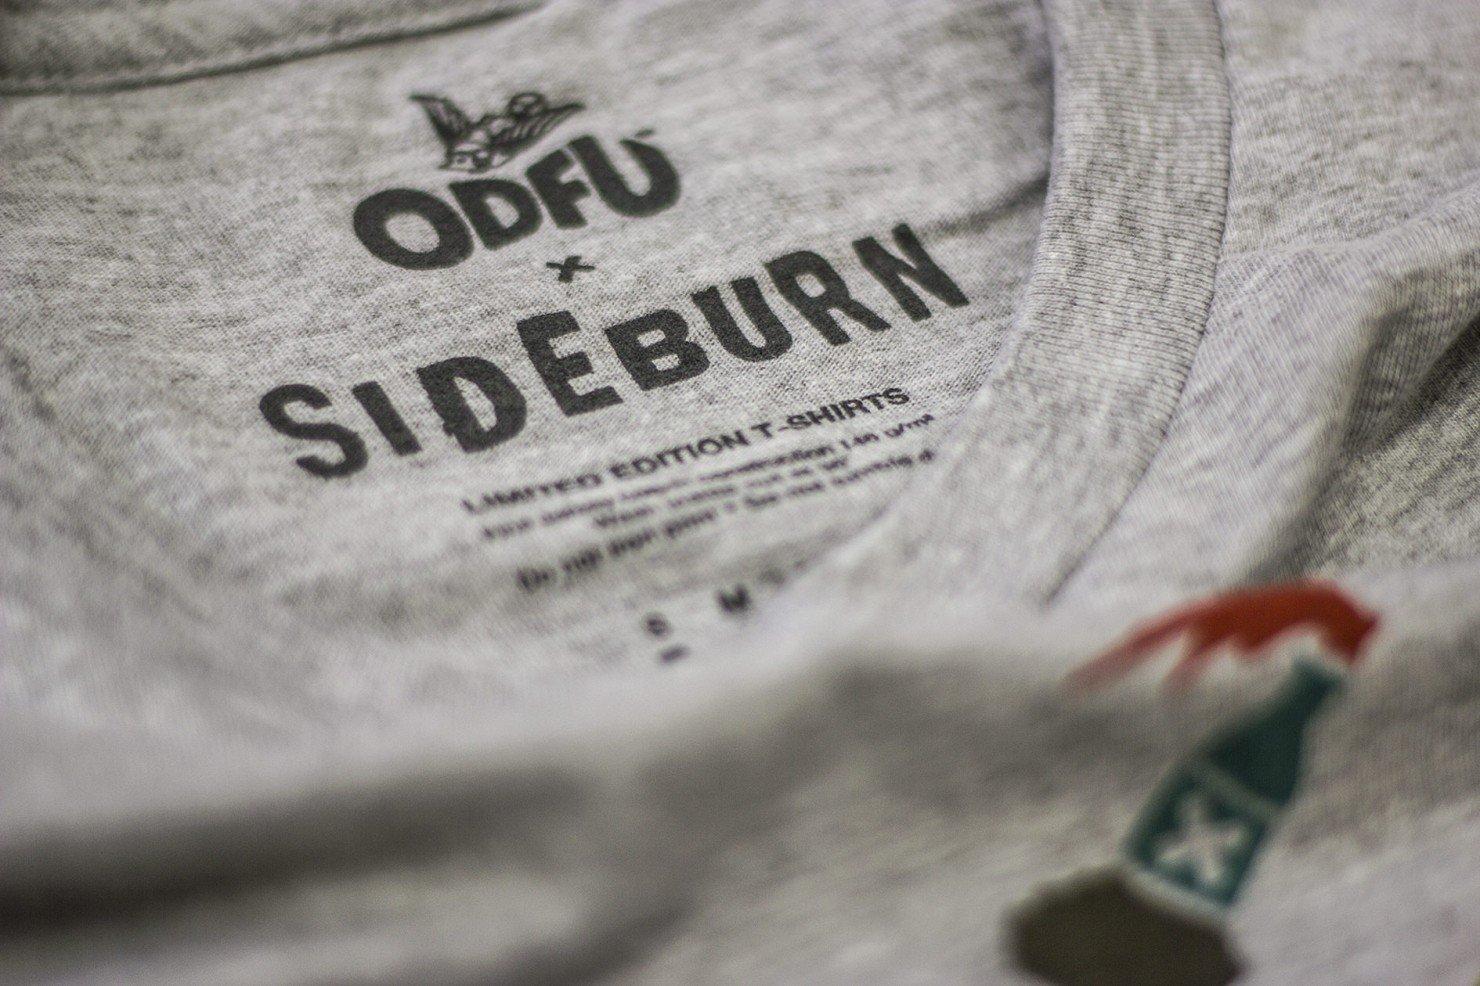 ODFU x Sideburn T-Shirt 1